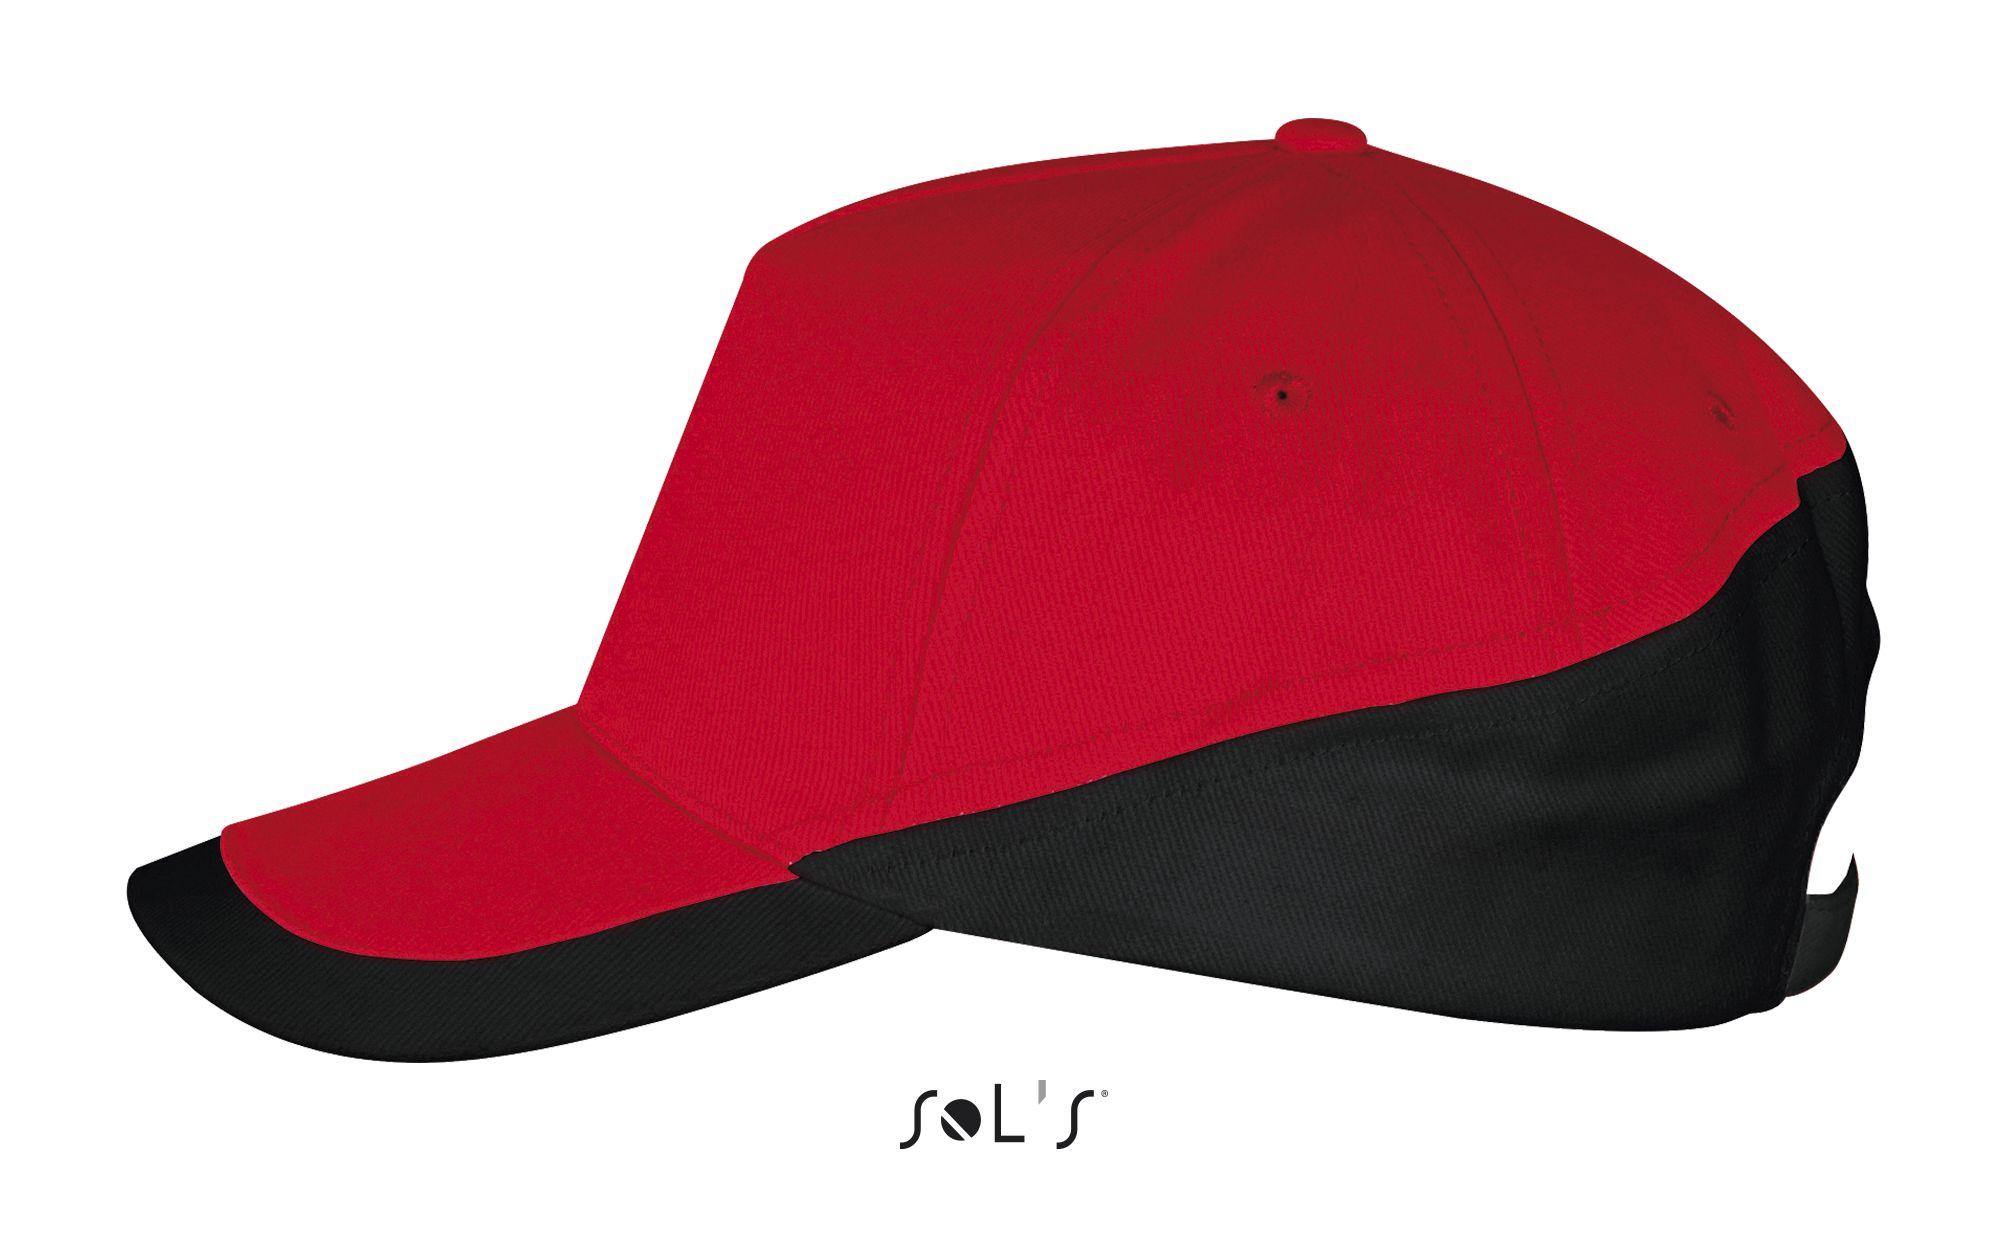 937 - Red / Black